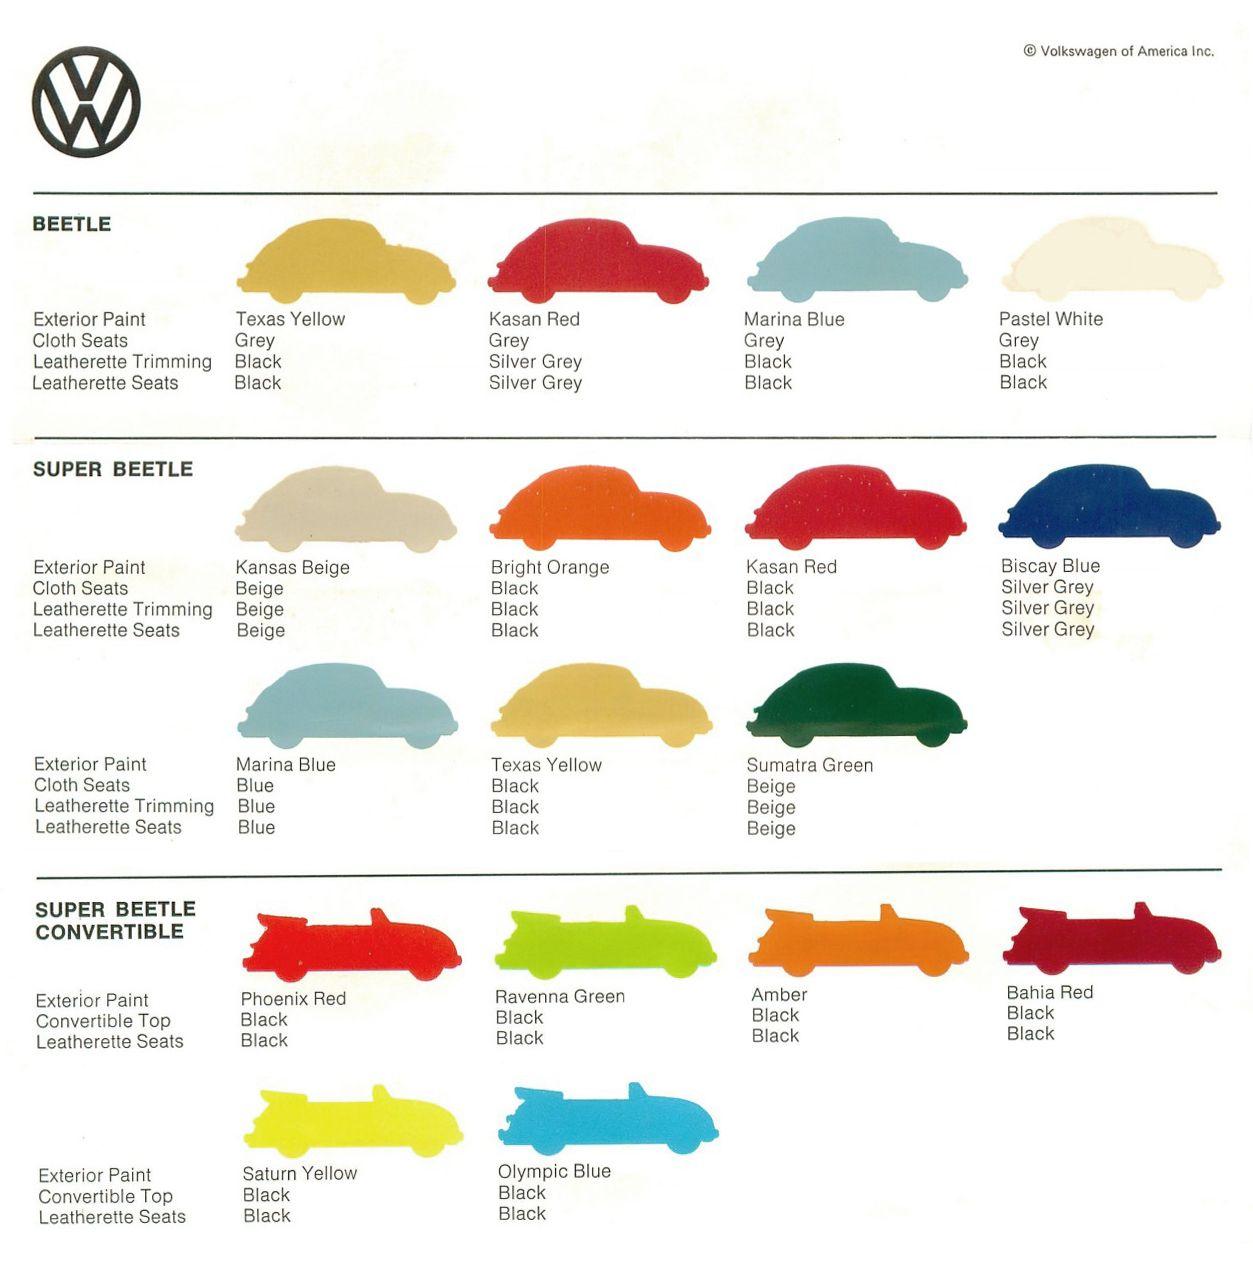 medium resolution of vw beetle color sheet 1973 volkswagen of america via thesamba